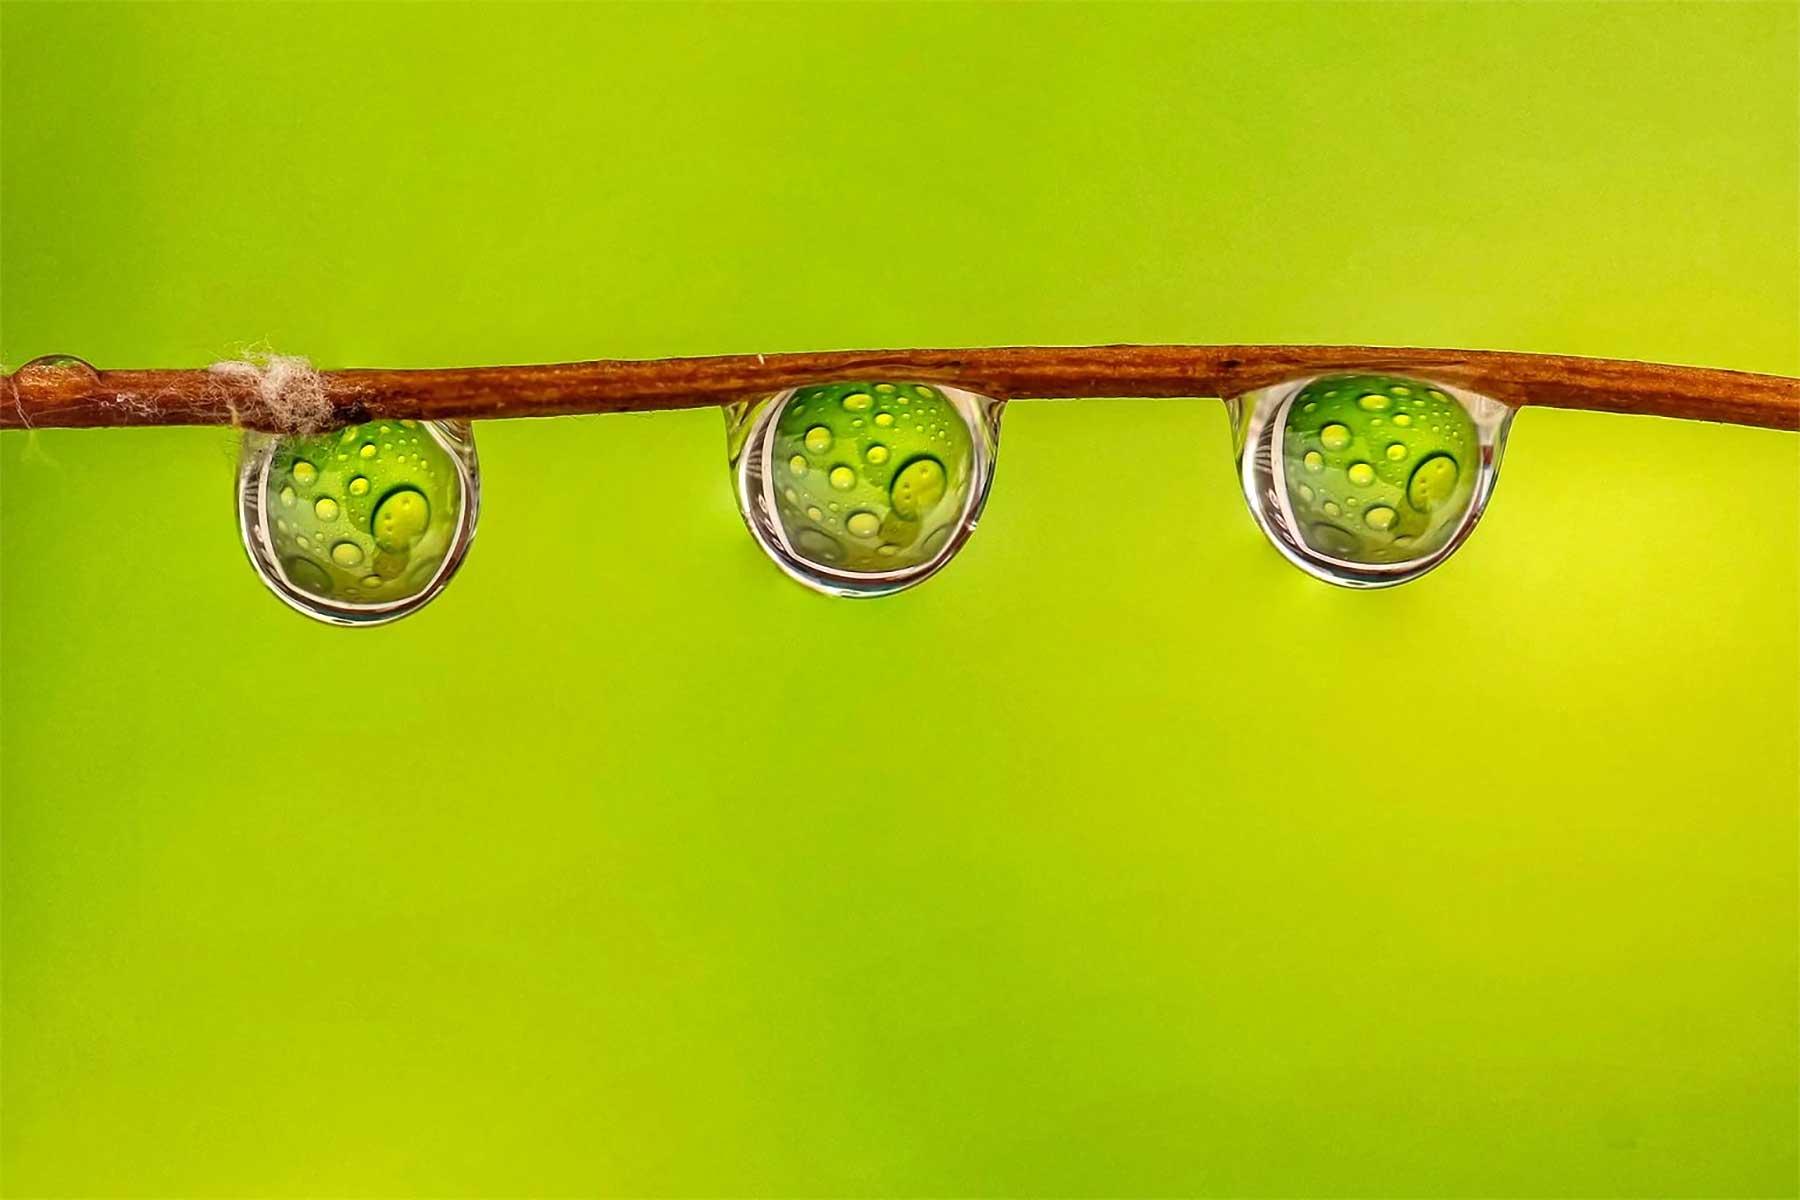 Wassertropfen-Fotografien von António Pereira Antonio-Pereira-Water-Drops-photography_11